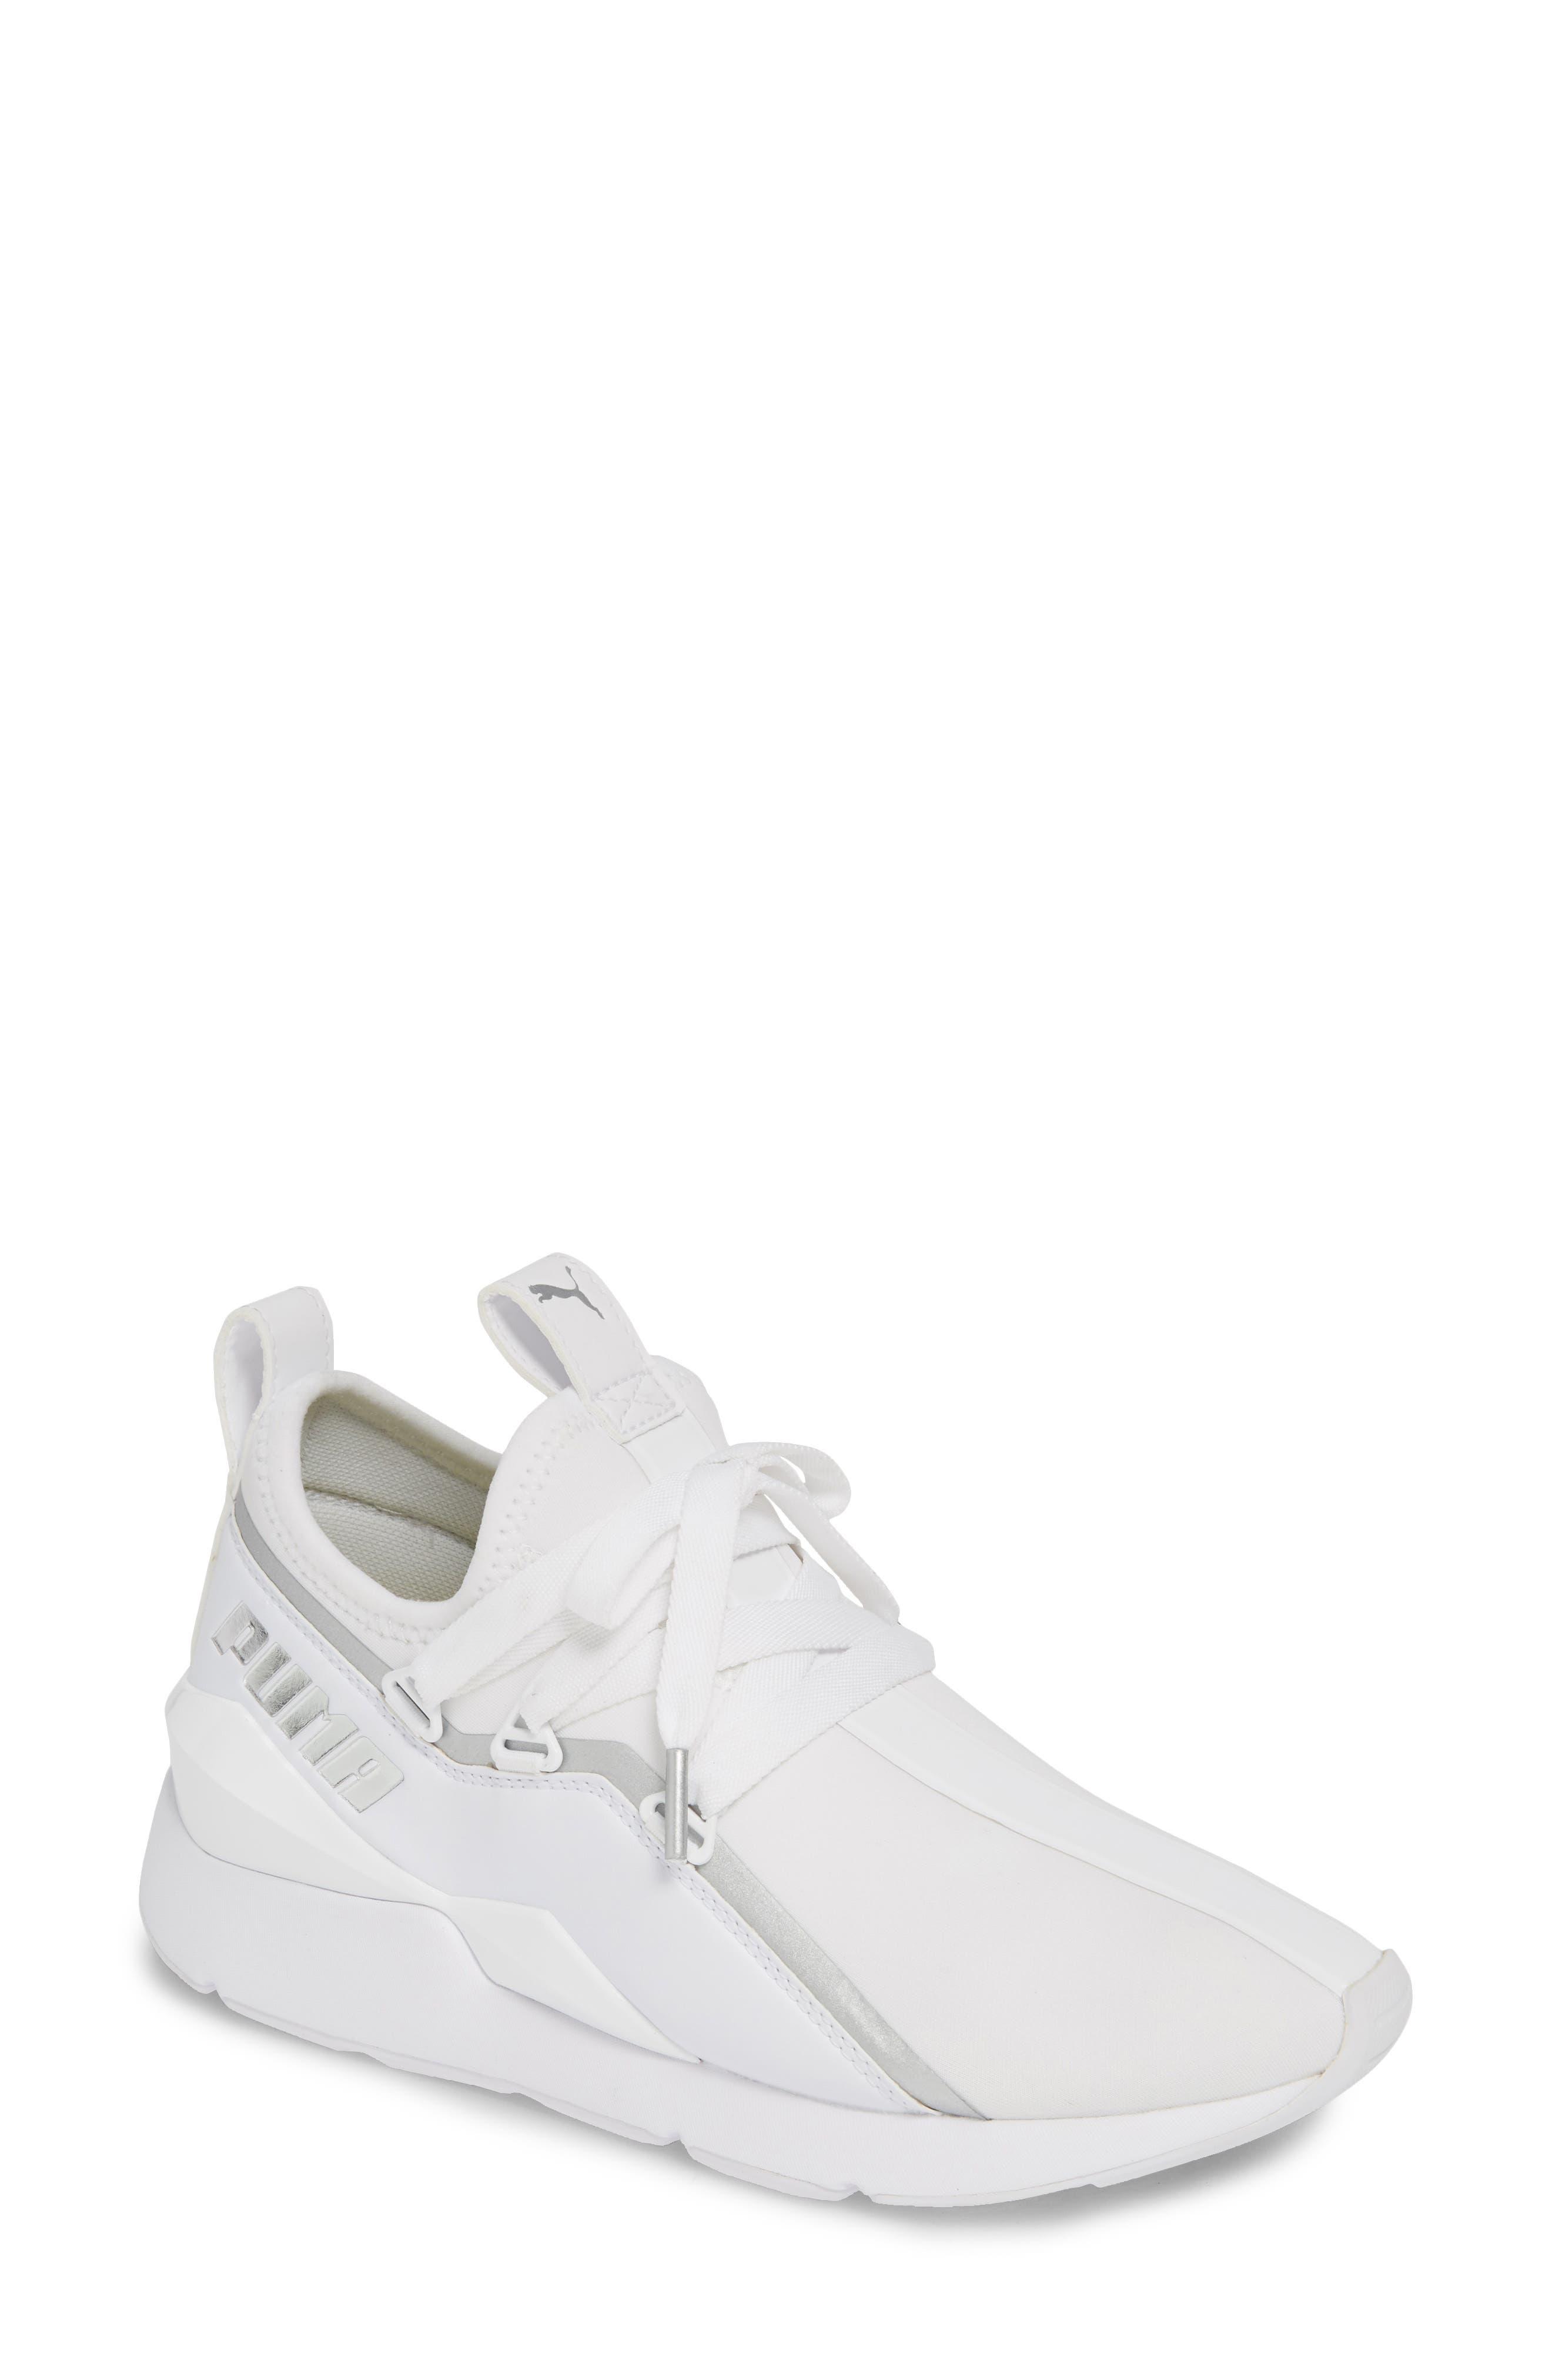 b4941861d8b PUMA Shoes for Women